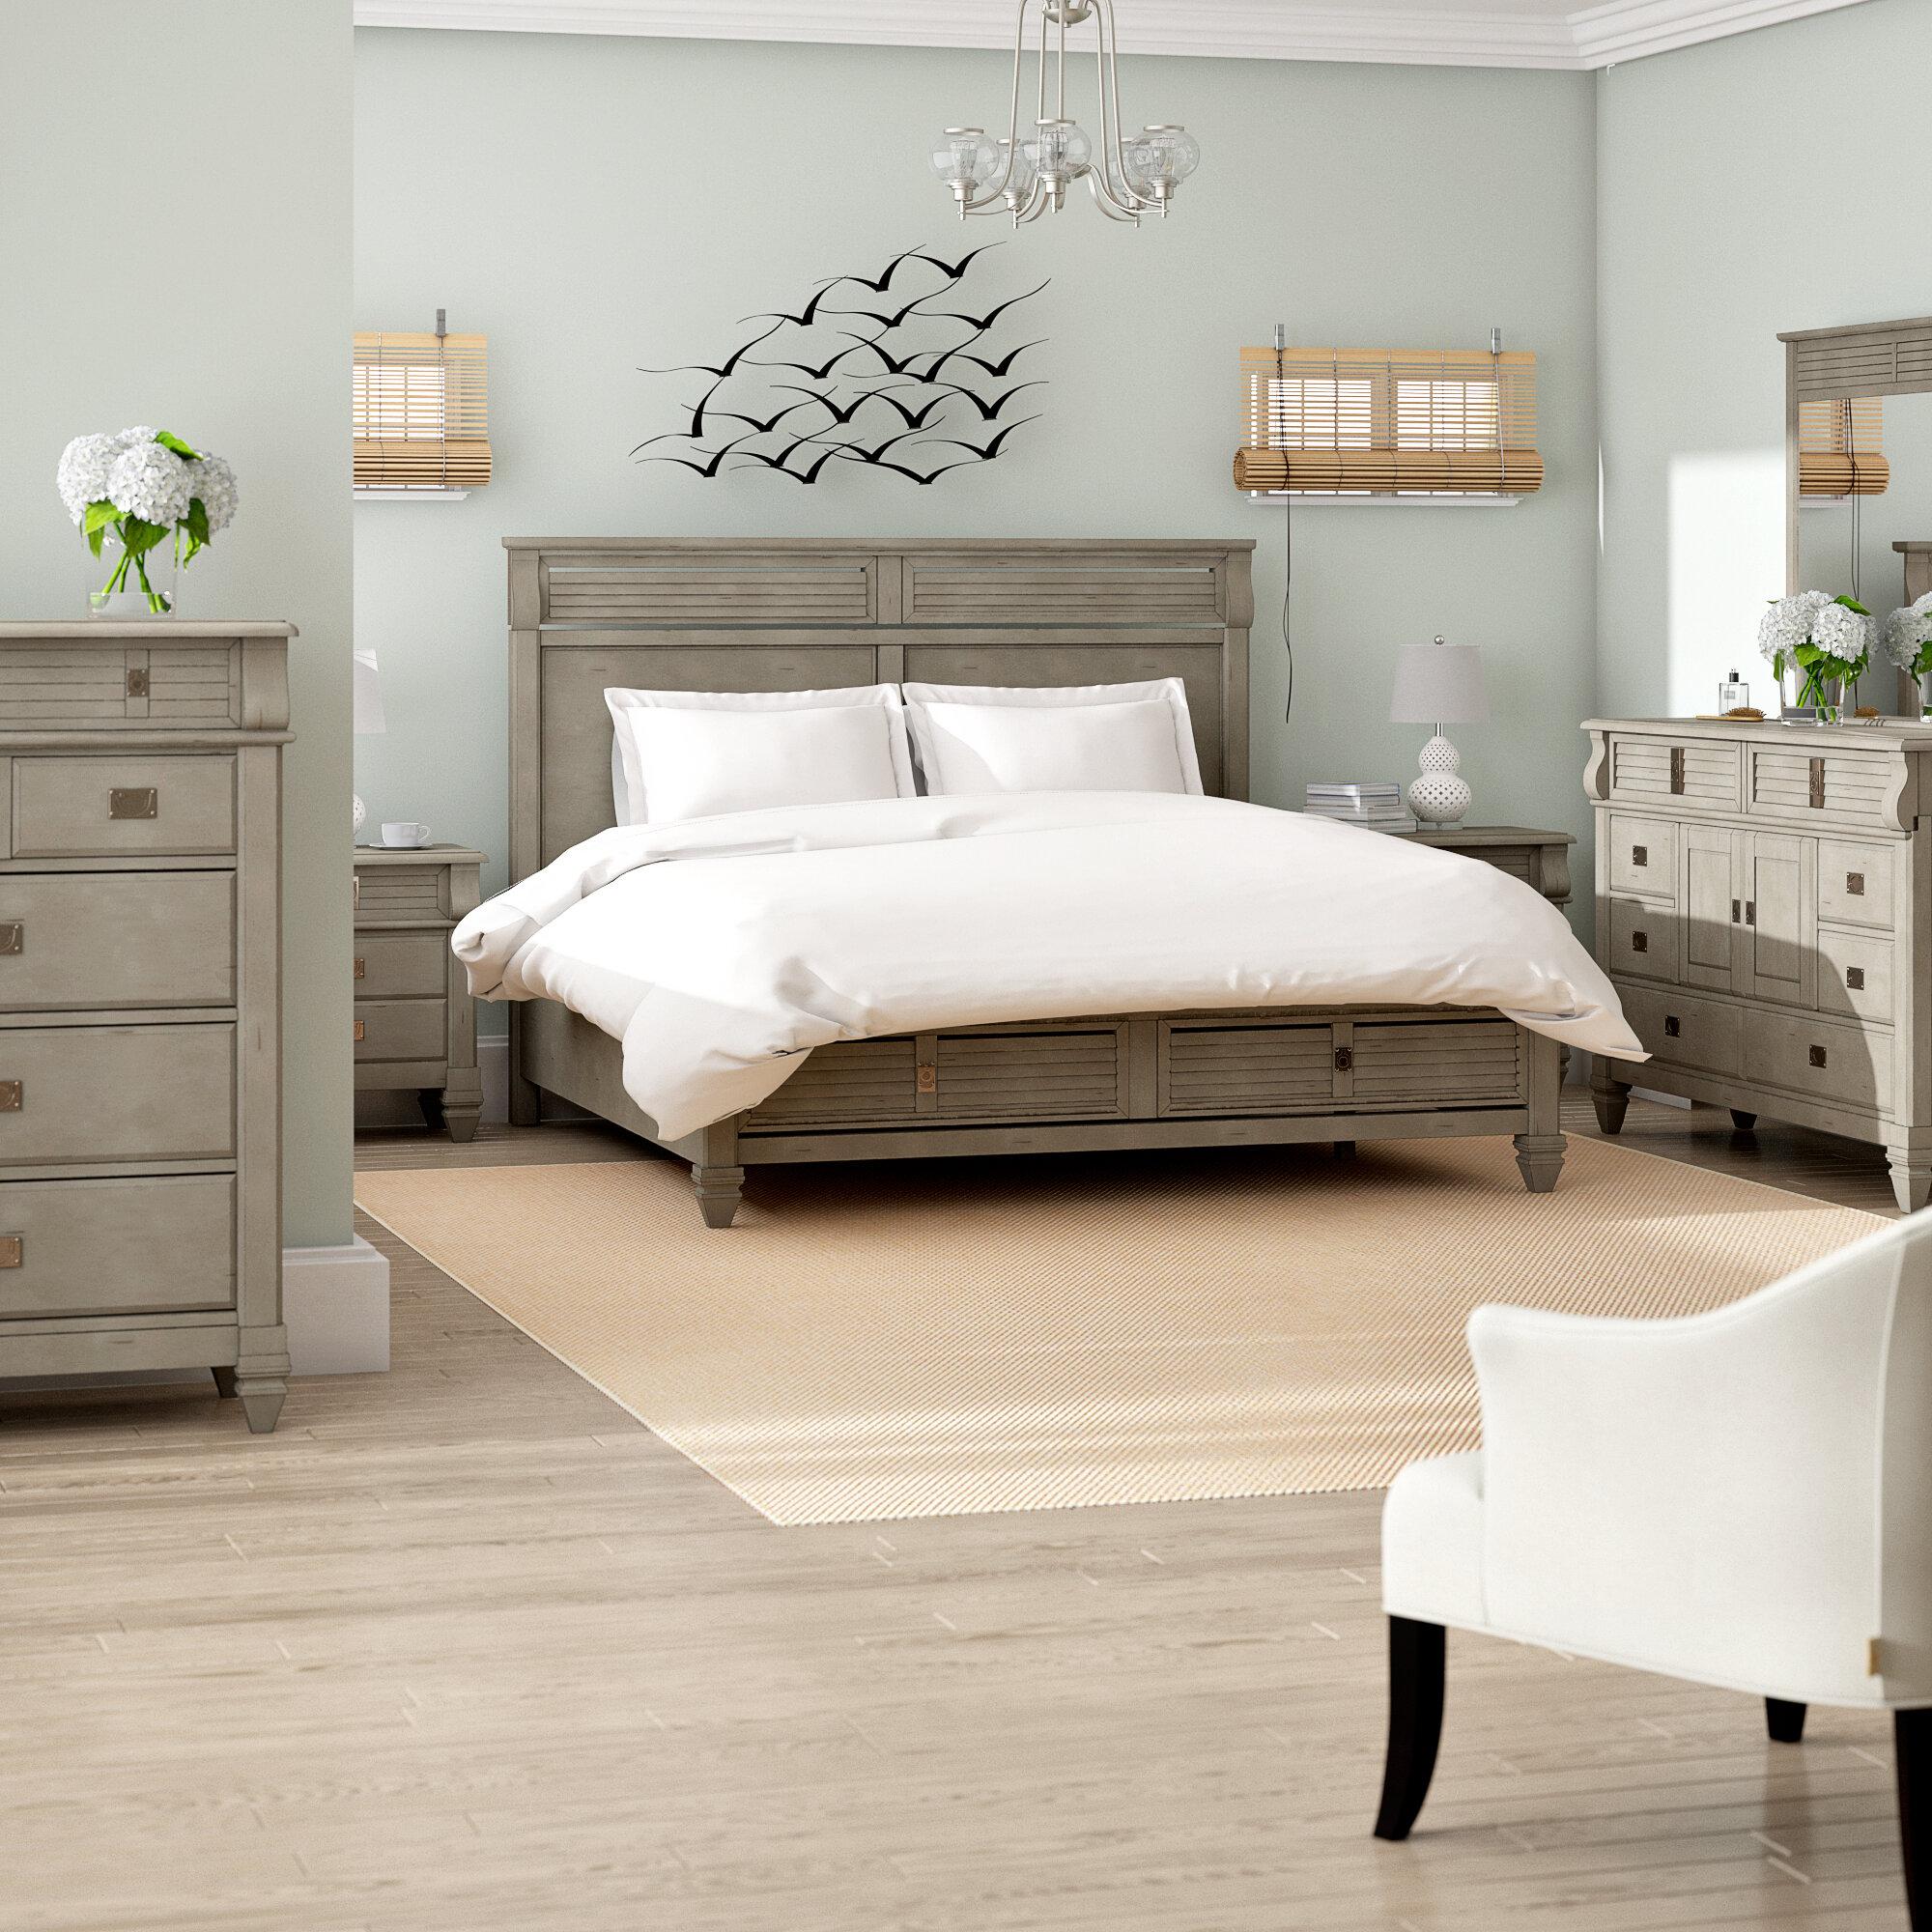 Beachcrest Home Vasilikos Solid Wood Construction Platform 6 Piece Bedroom Set Reviews Wayfair